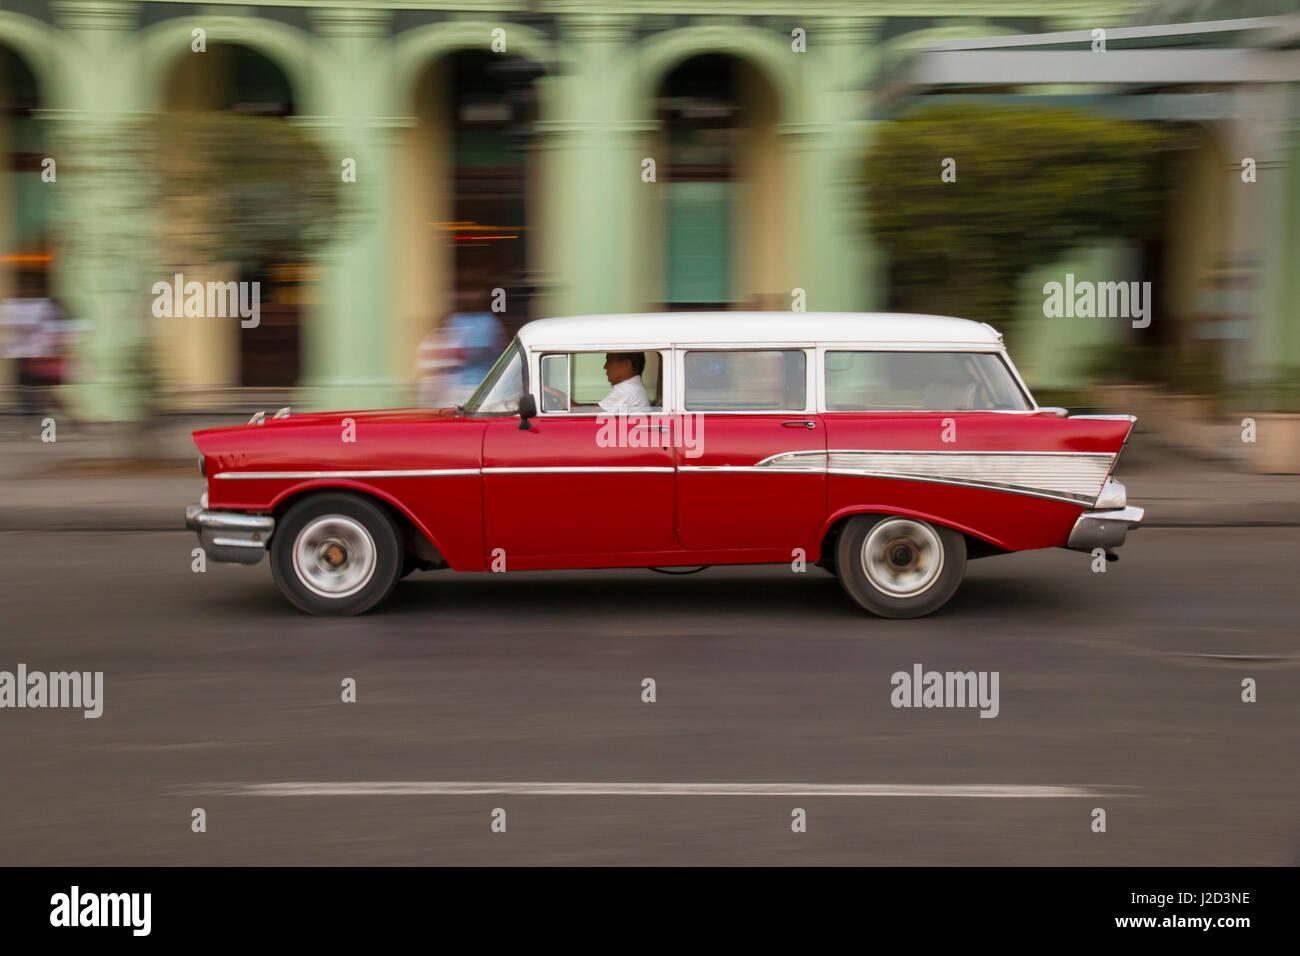 Caribbean, Cuba, Havana. 1957 Chevrolet Nomad. Collectible ...